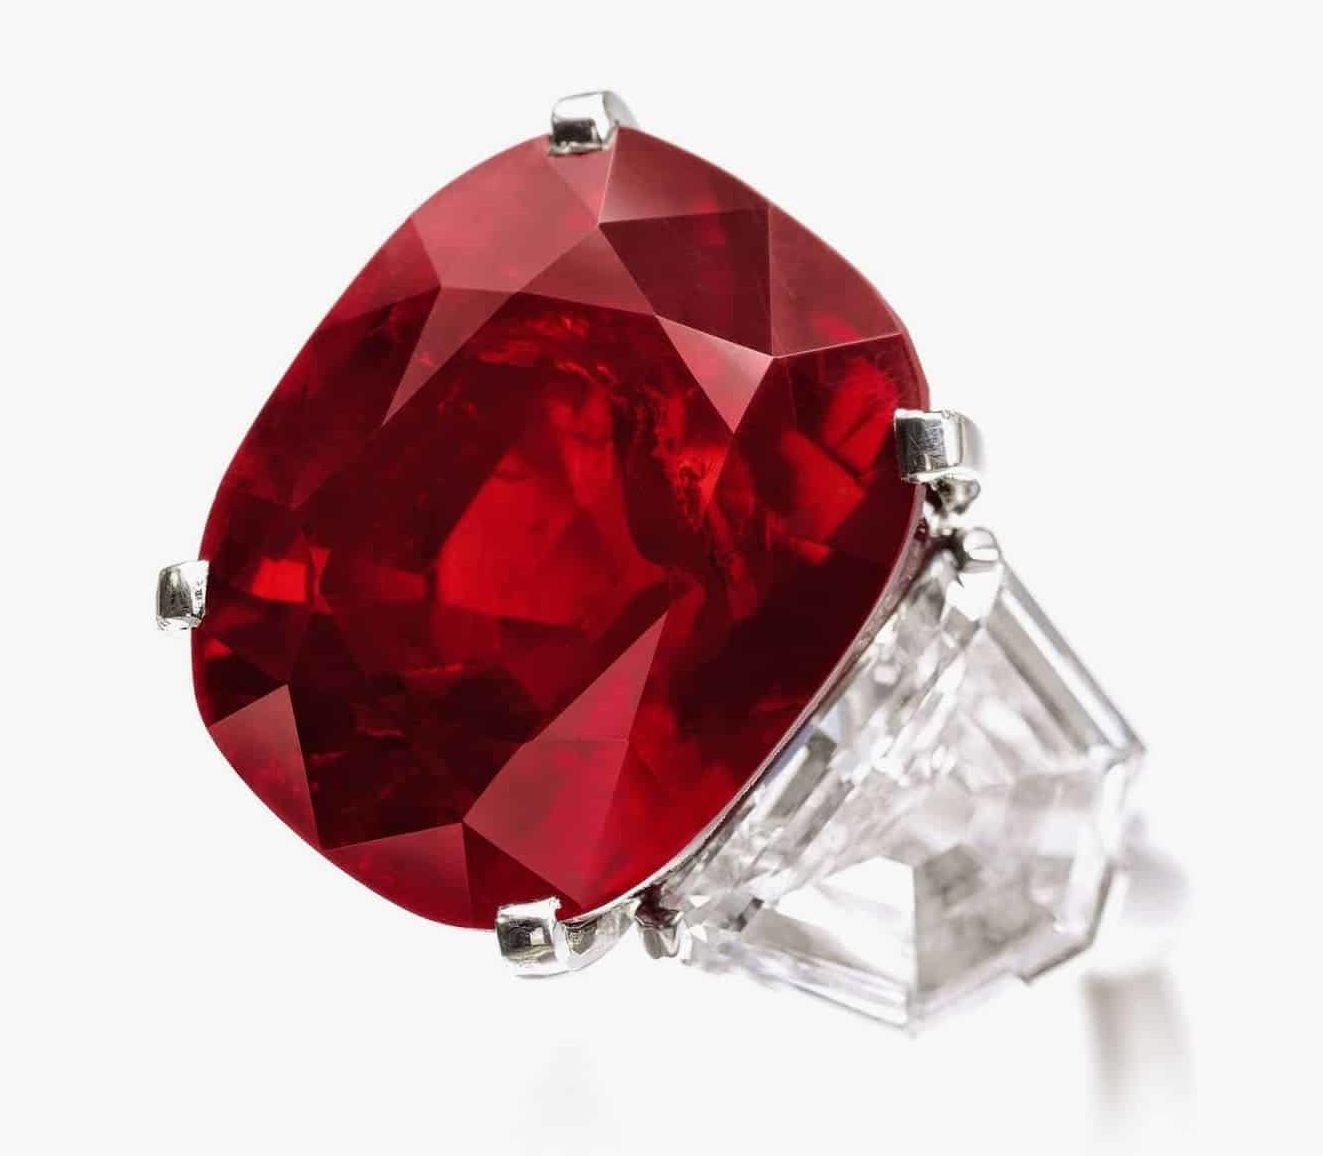 Рубин ярко-красного цвета